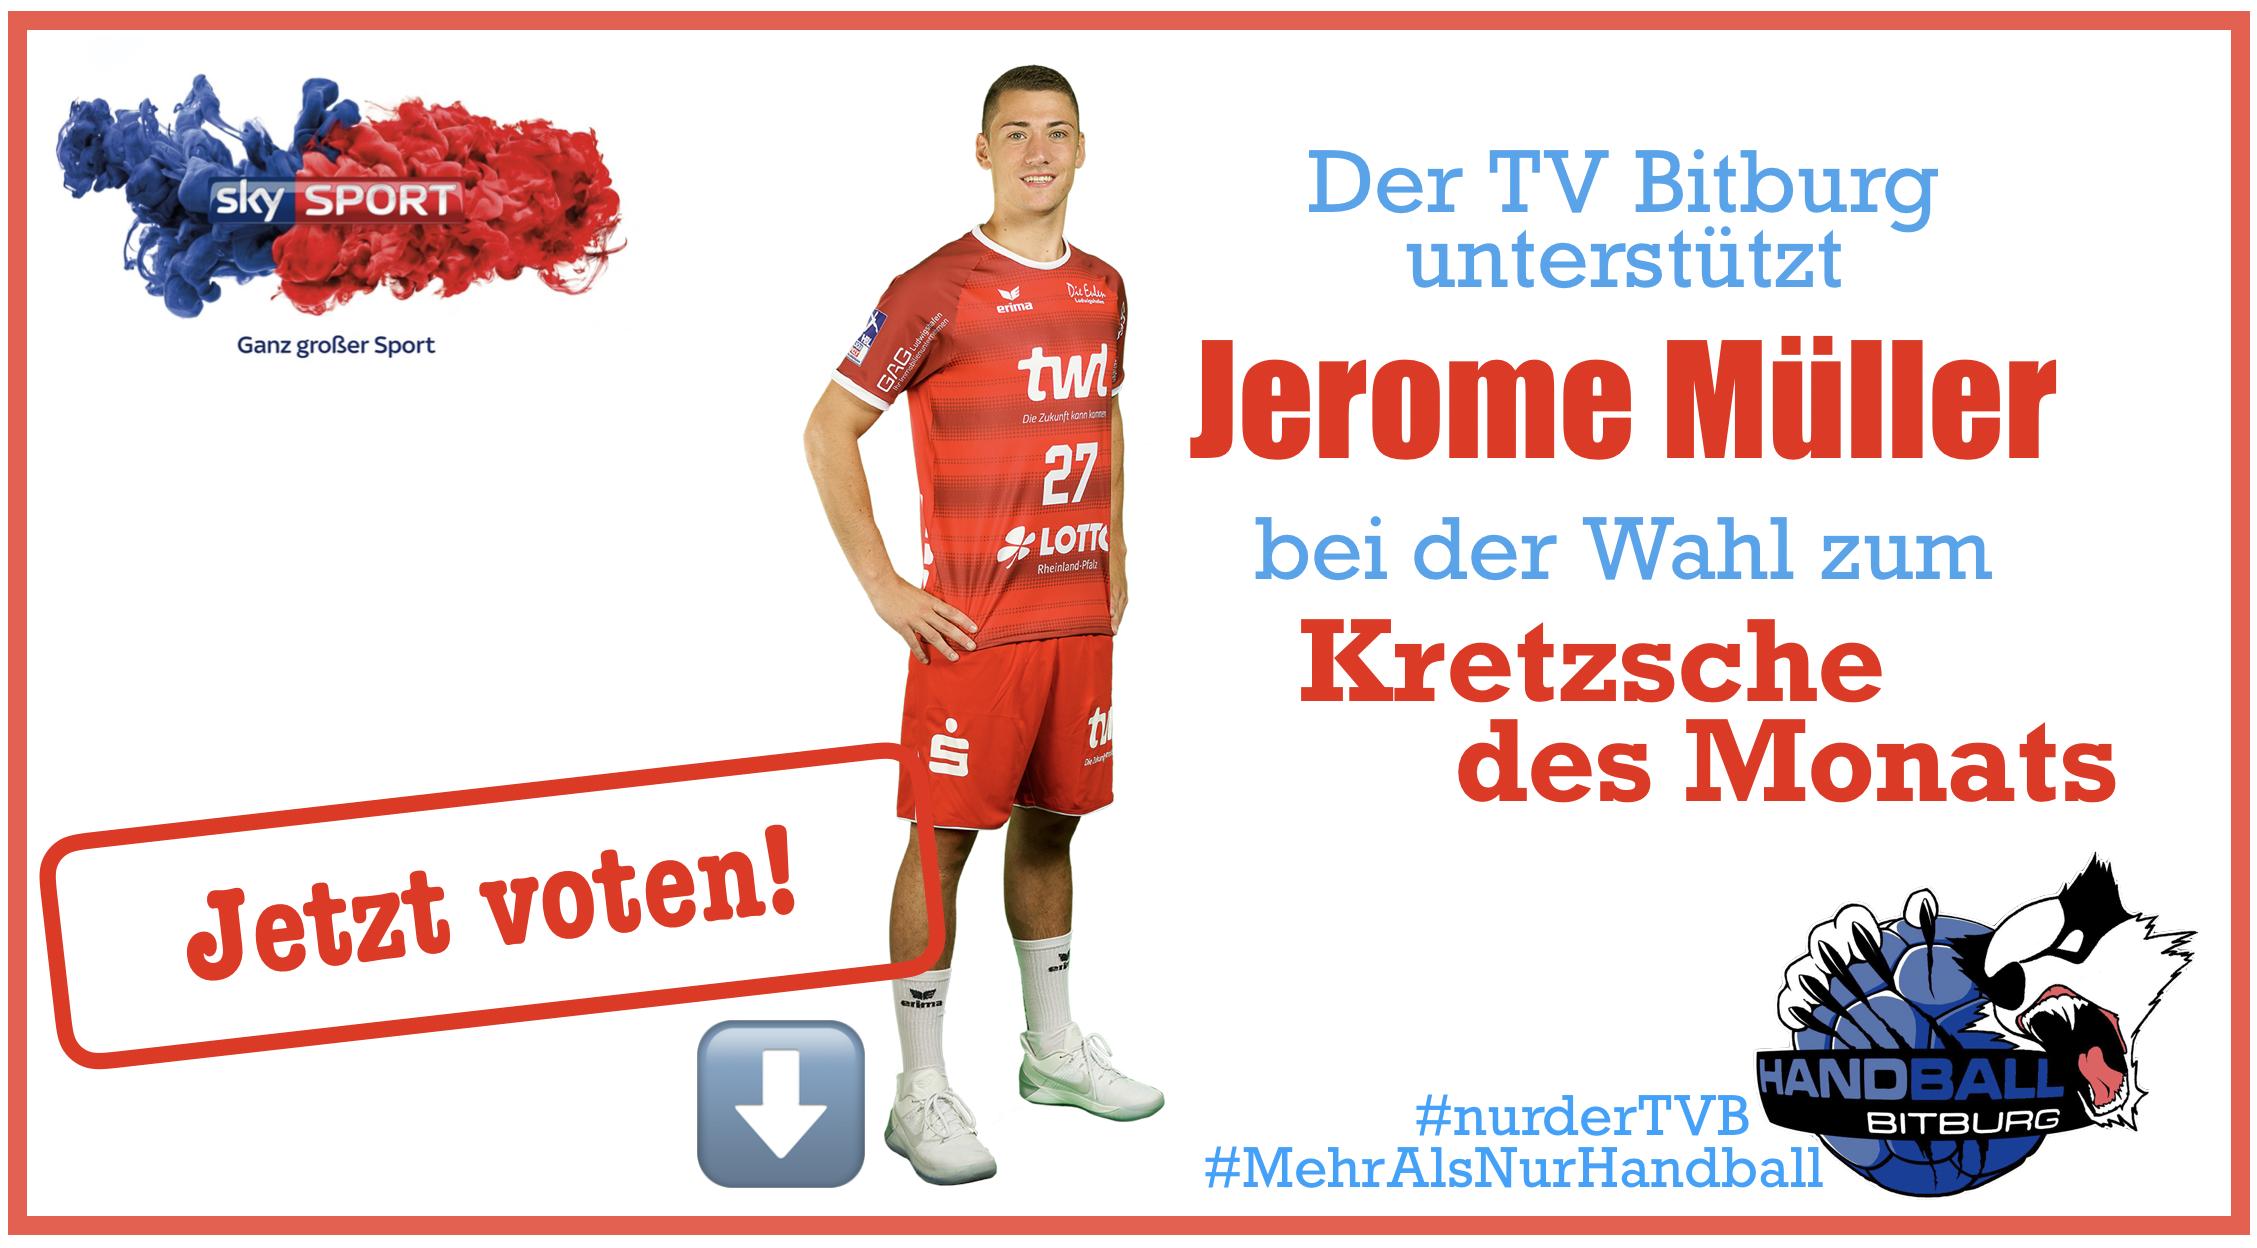 Jerome Müller zur Wahl beim Kretzsche des Monats